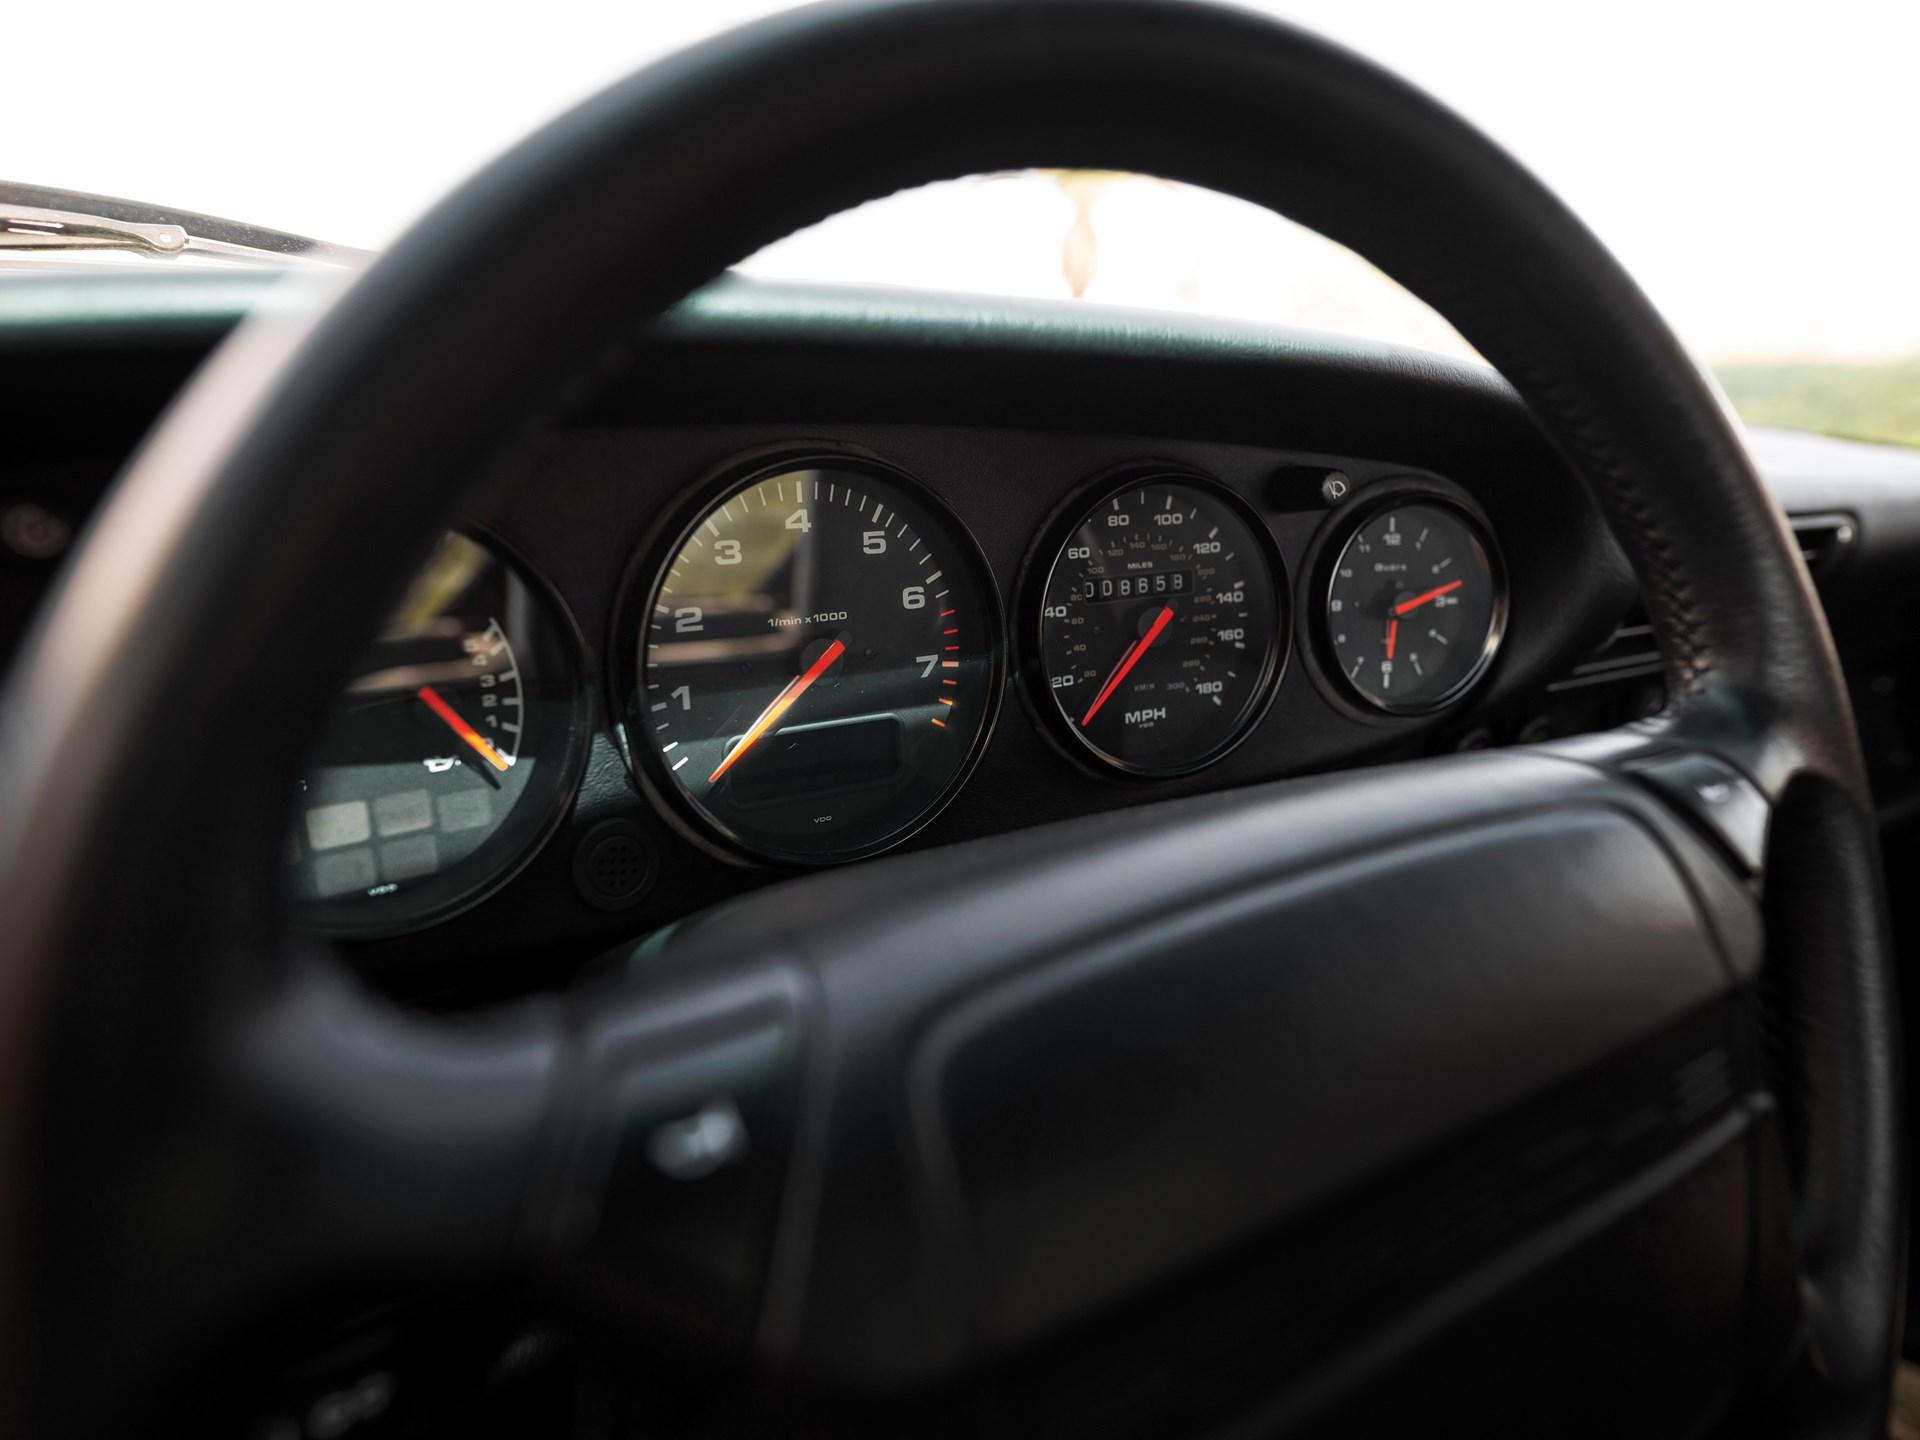 1994 Porsche 911 Turbo S 'Package'